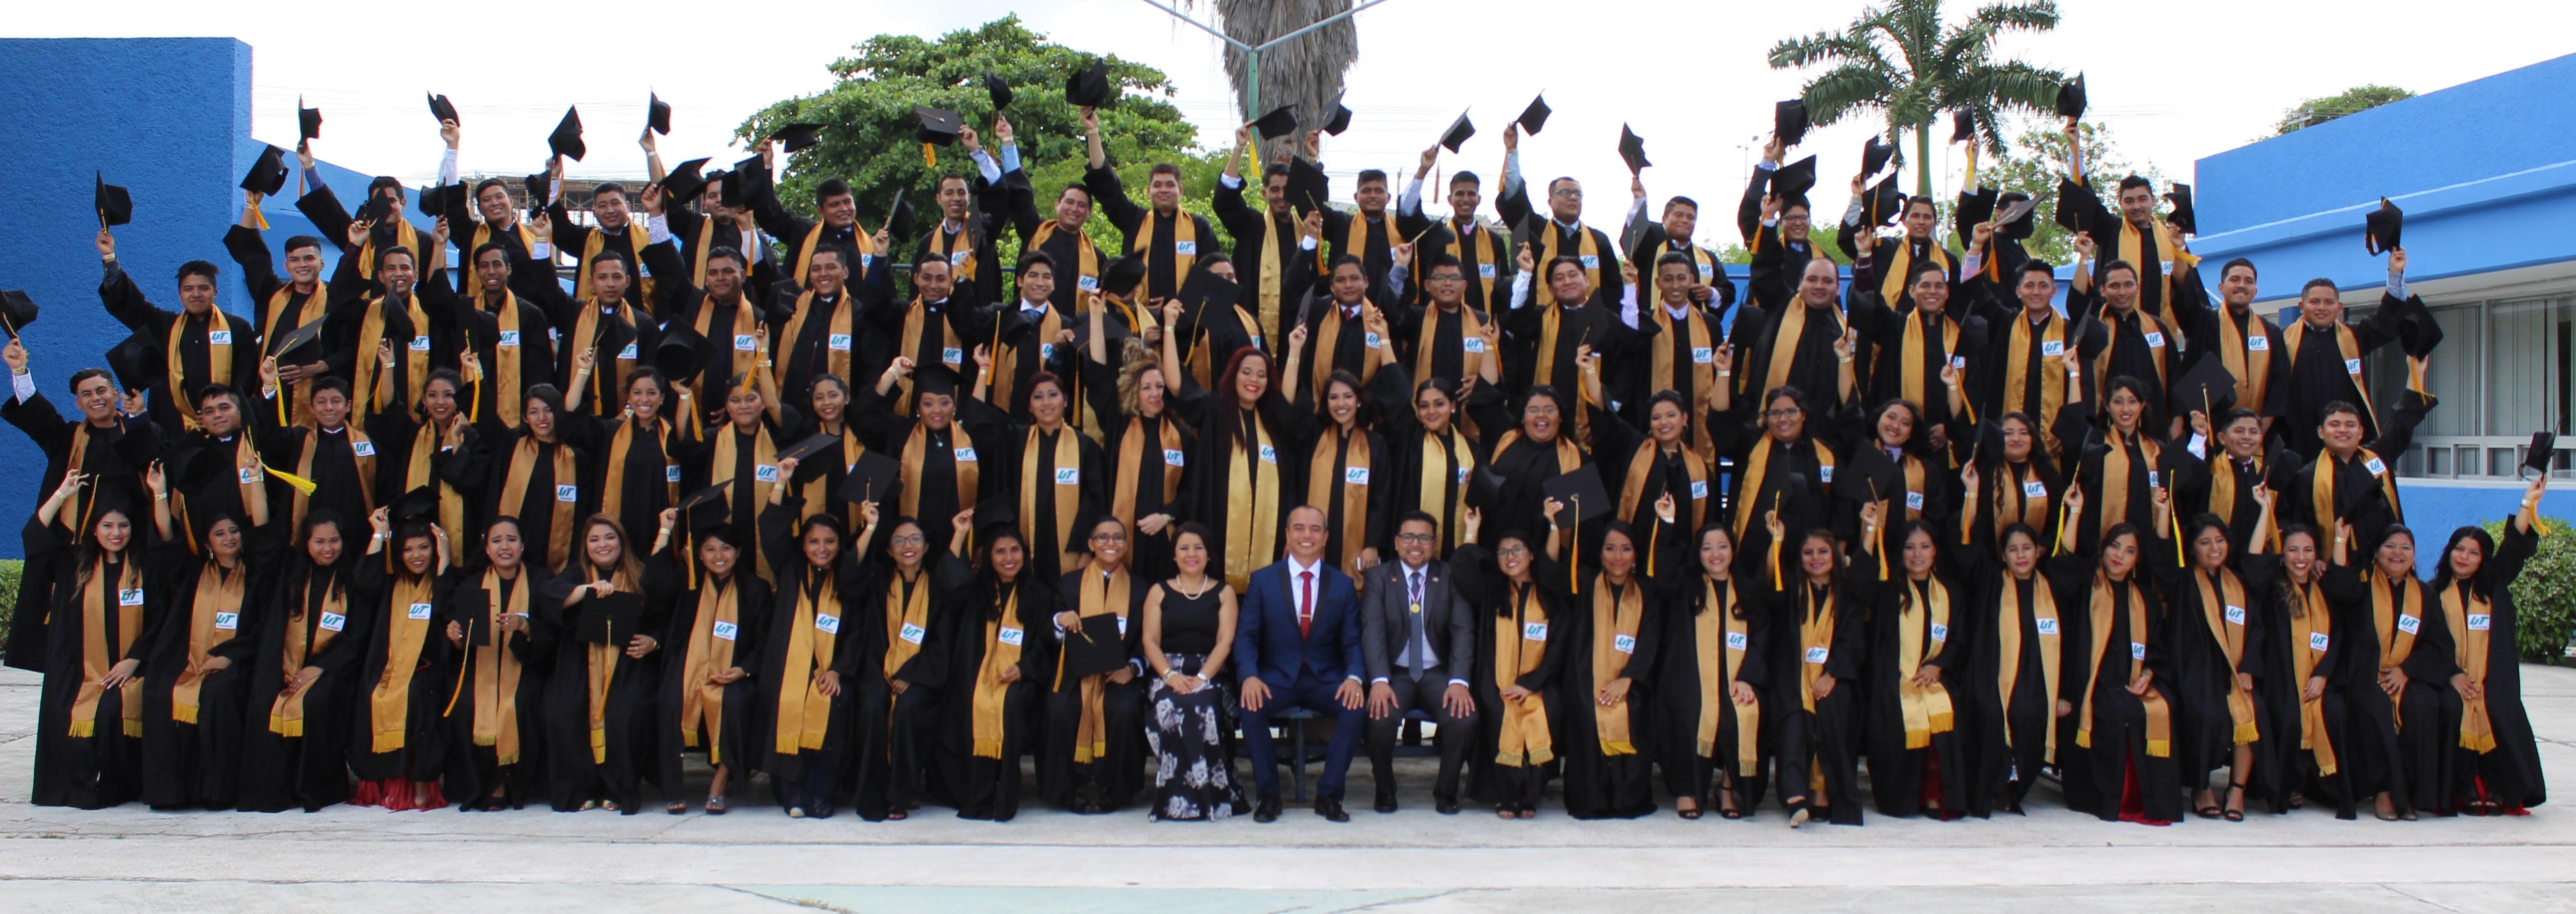 Entrega Protocolaria de Documentos para Licenciaturas e Ingenierías 2018